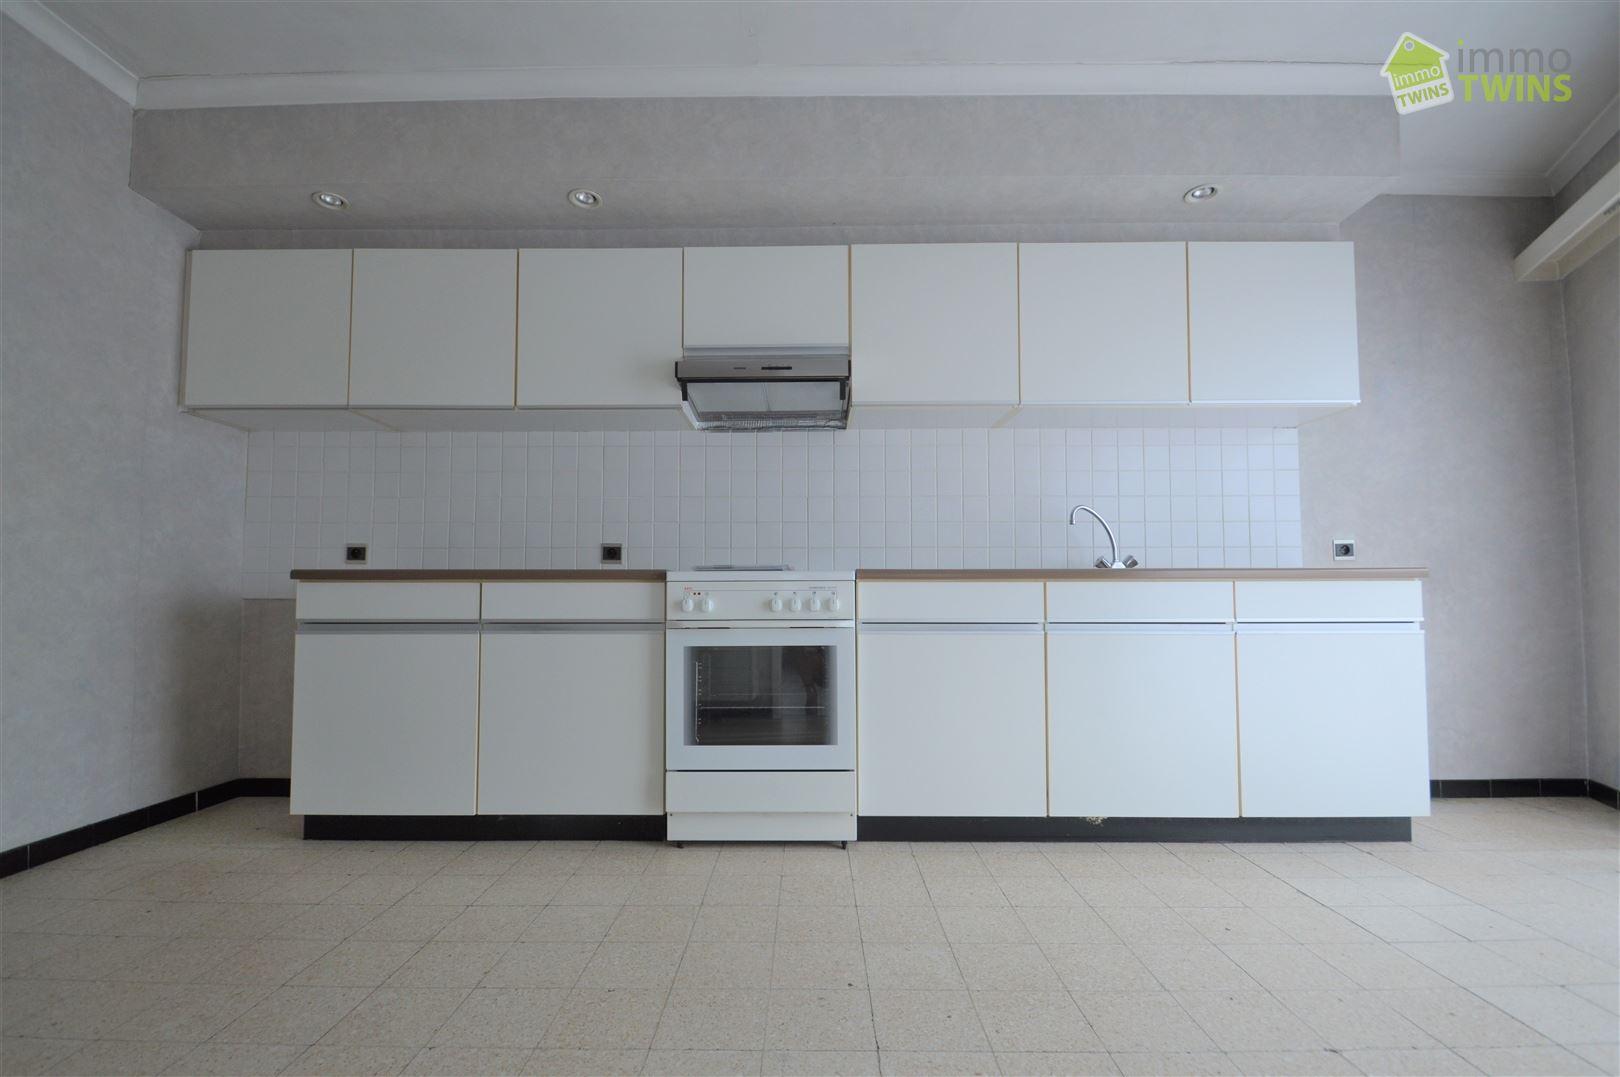 Foto 3 : Appartement te 9280 LEBBEKE (België) - Prijs € 625